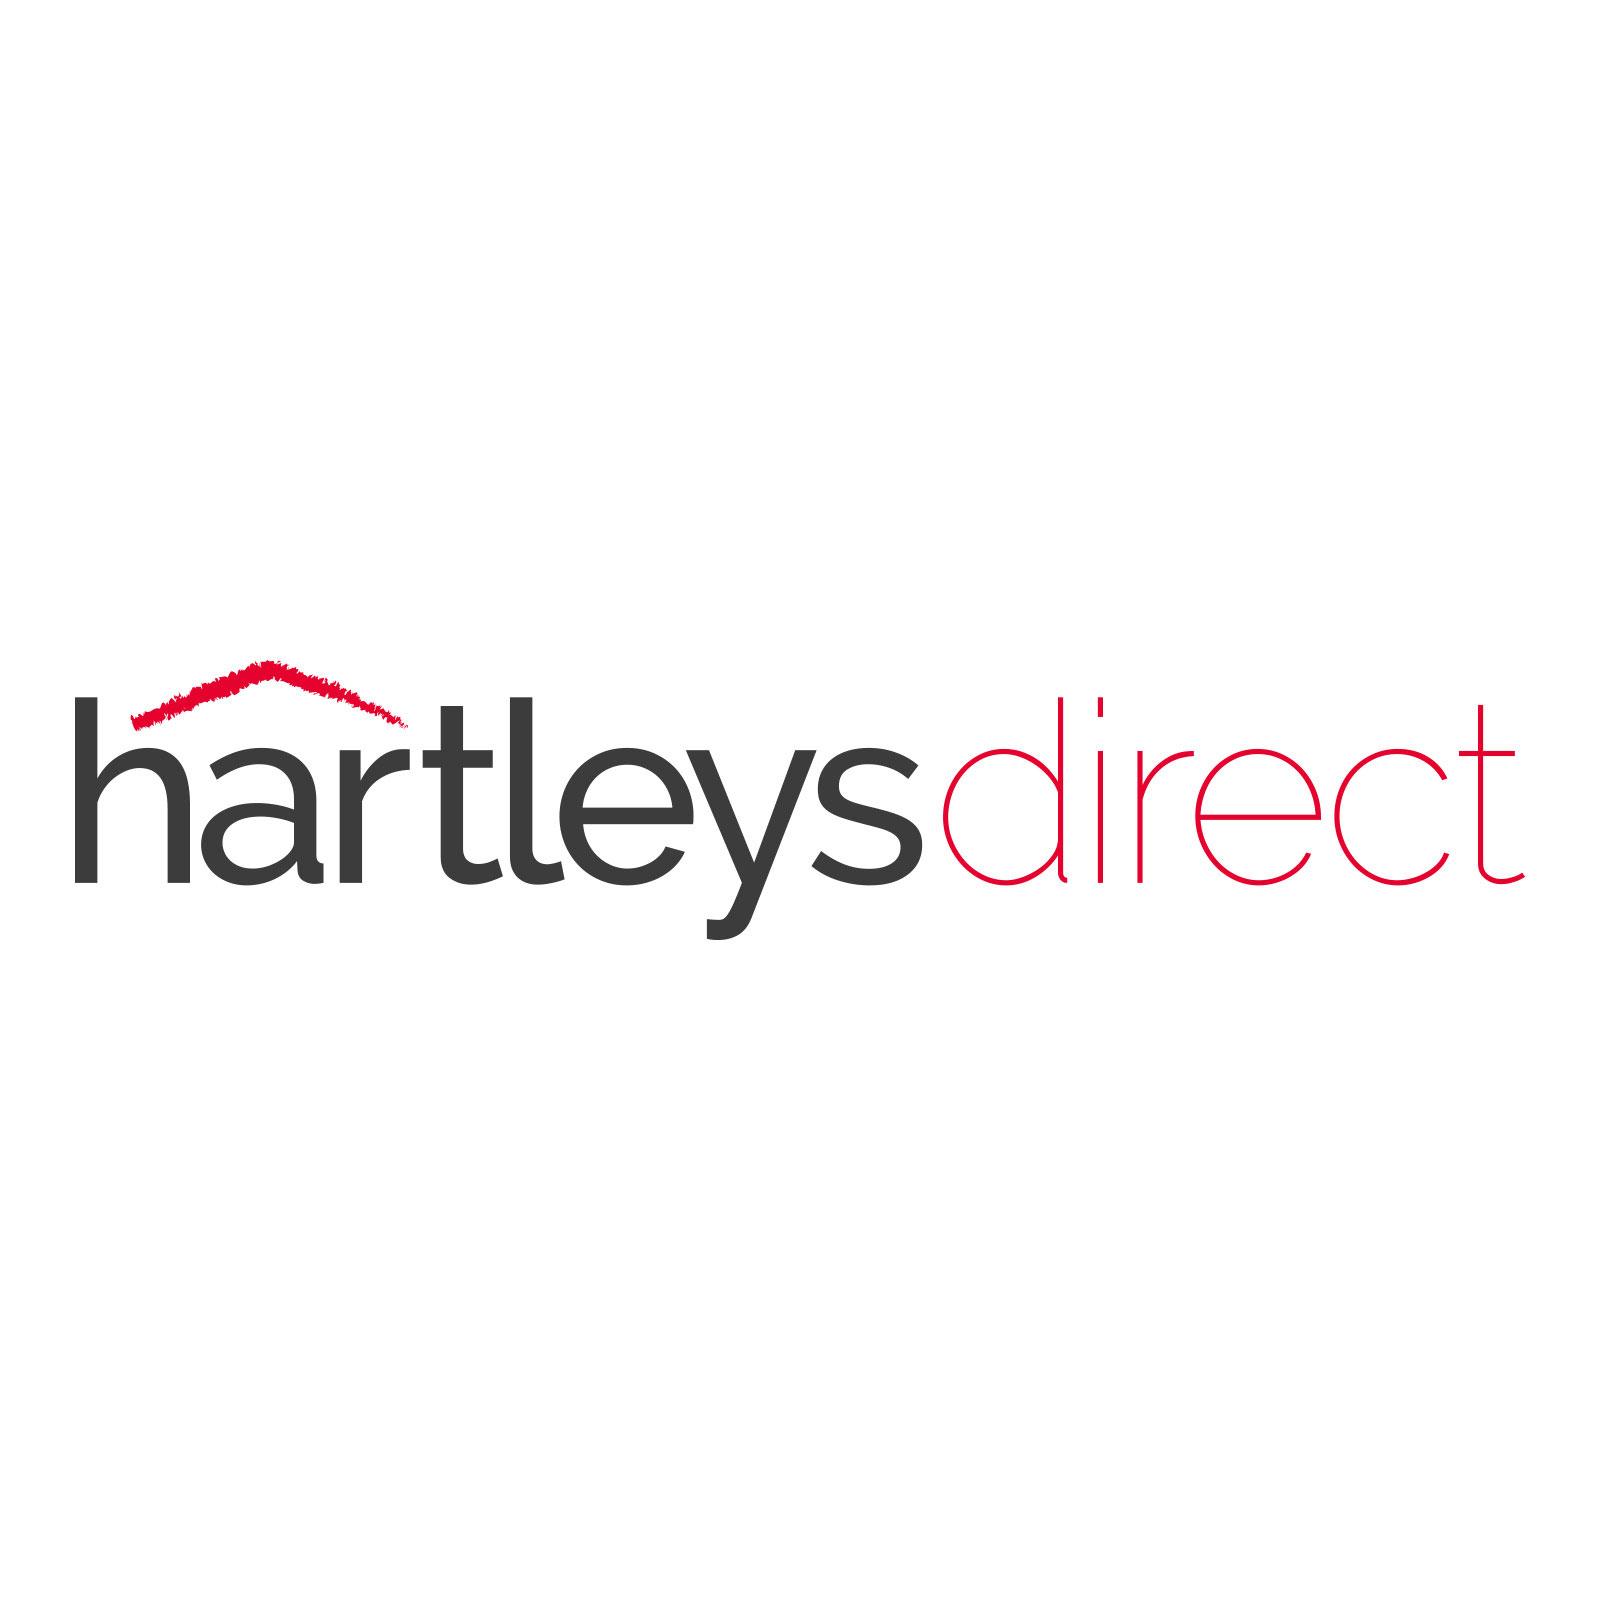 Hartleys-3-Rod-Hairpin-Leg-Showing-Sizes-on-White-Background.jpg